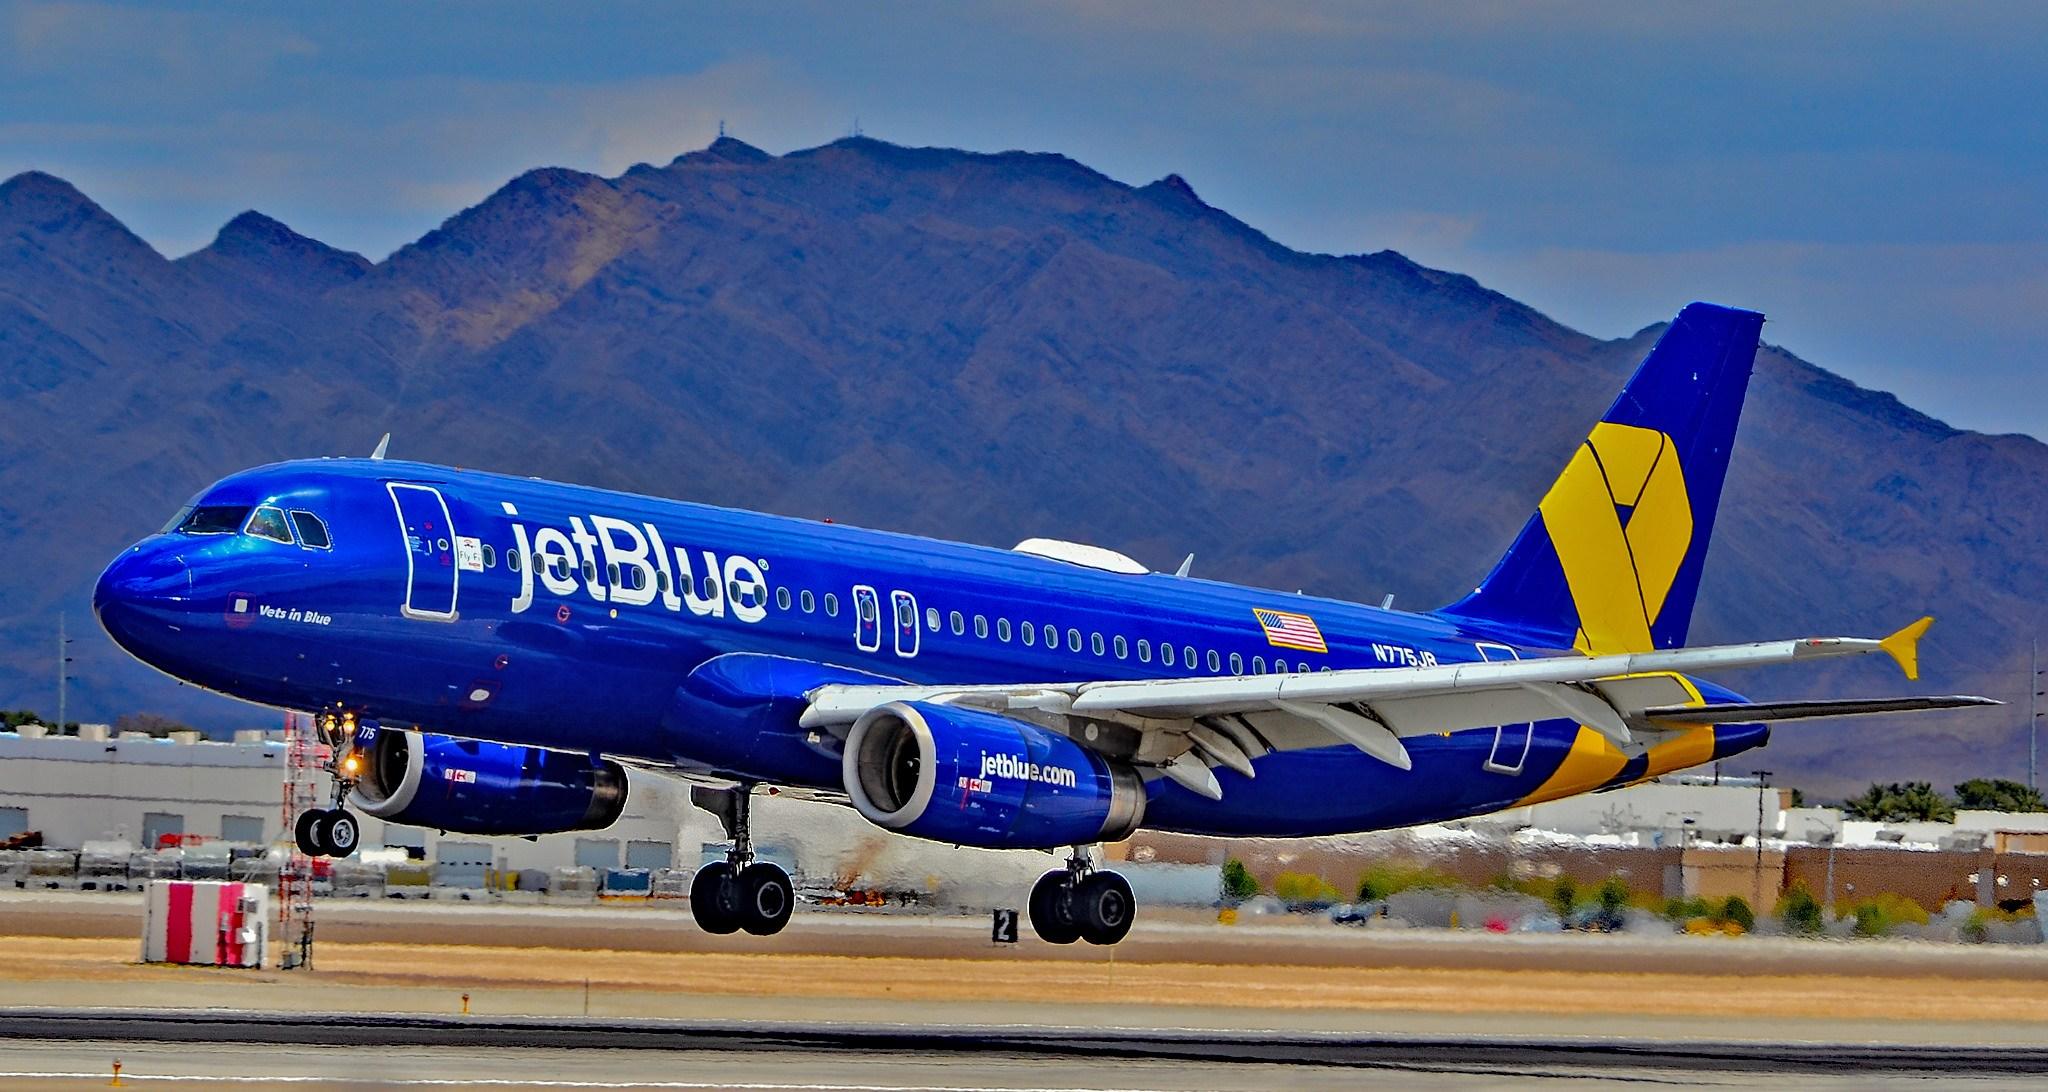 Jet Blue inicia vuelo Bosto-Habana. (INTERNET)